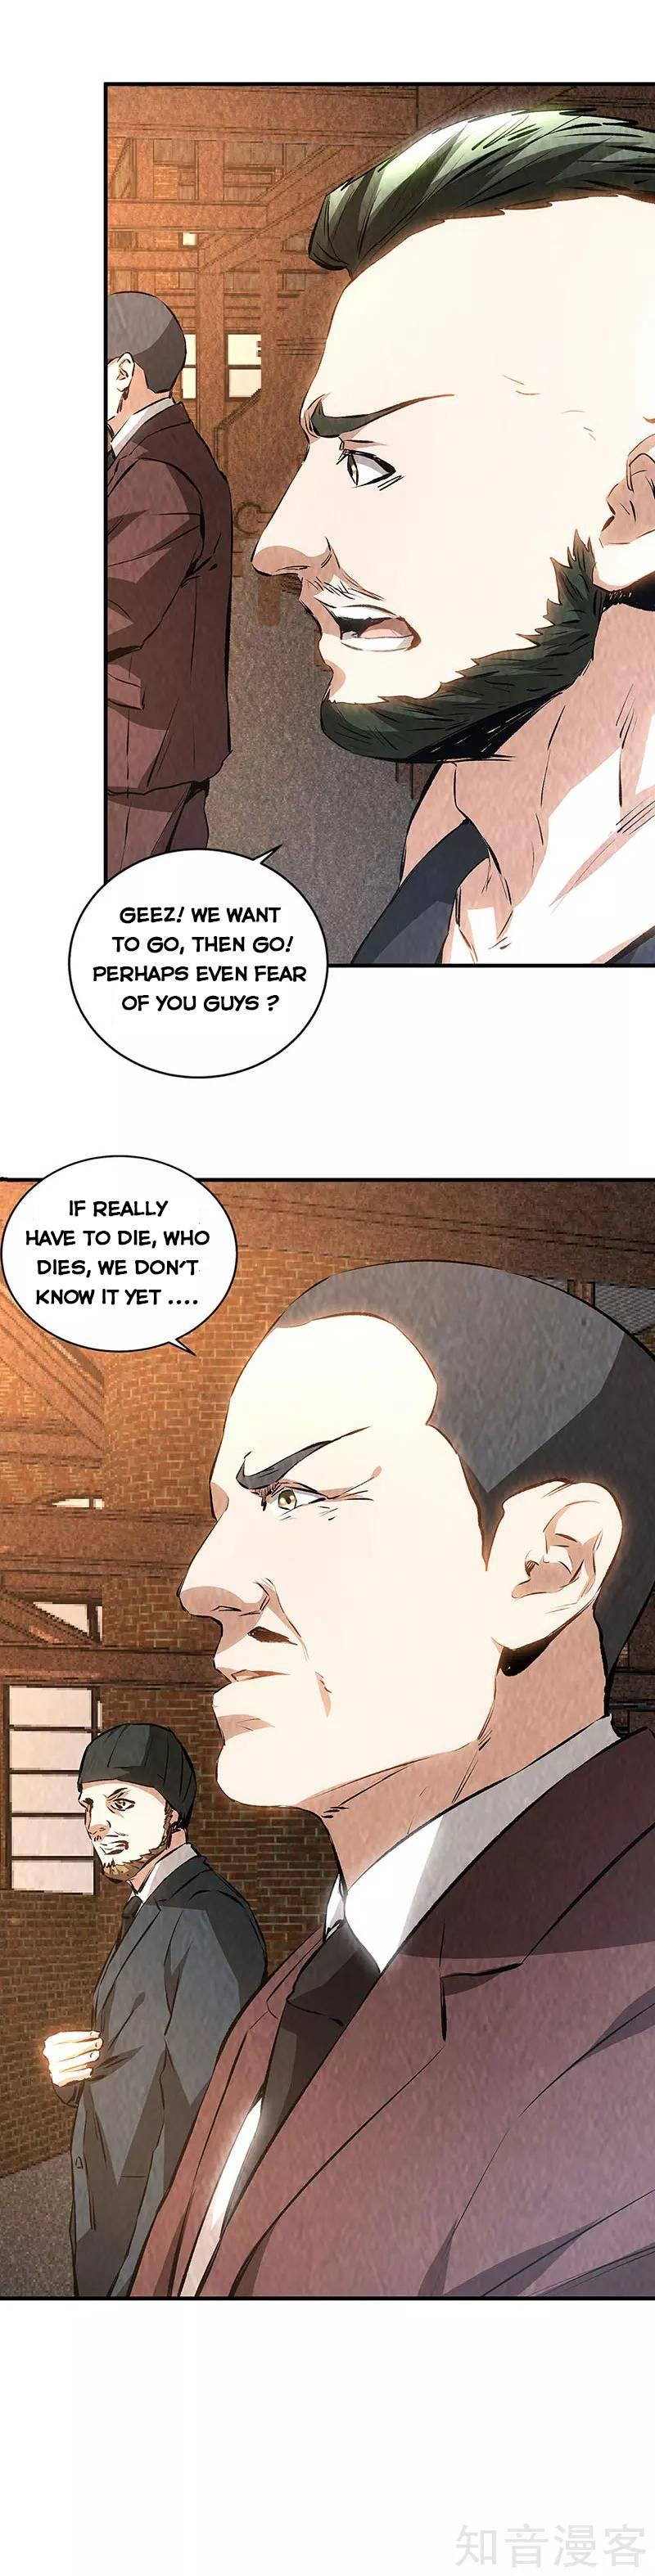 I Was Trash Chapter 216 page 11 - Mangakakalot